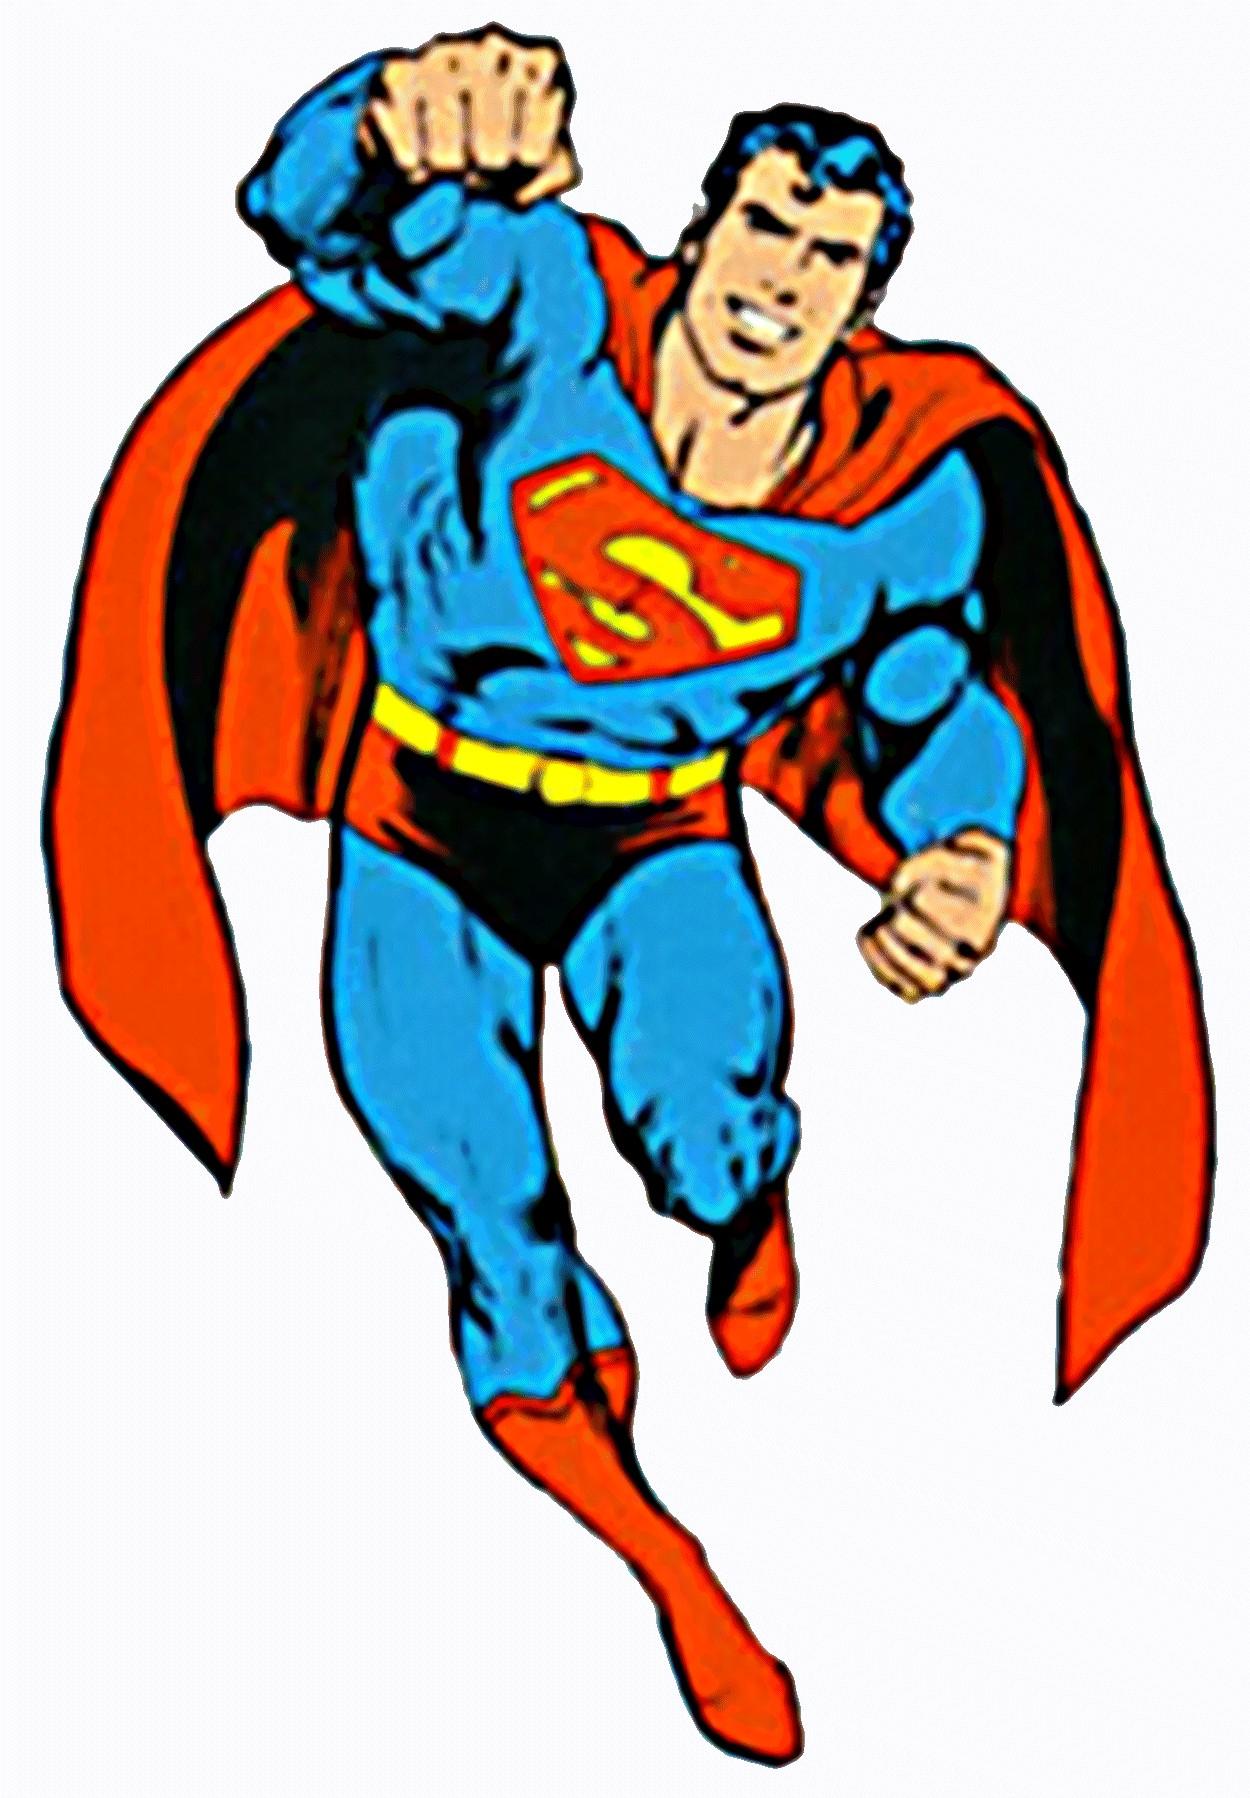 Free Superhero Clip Art Royalty Free.